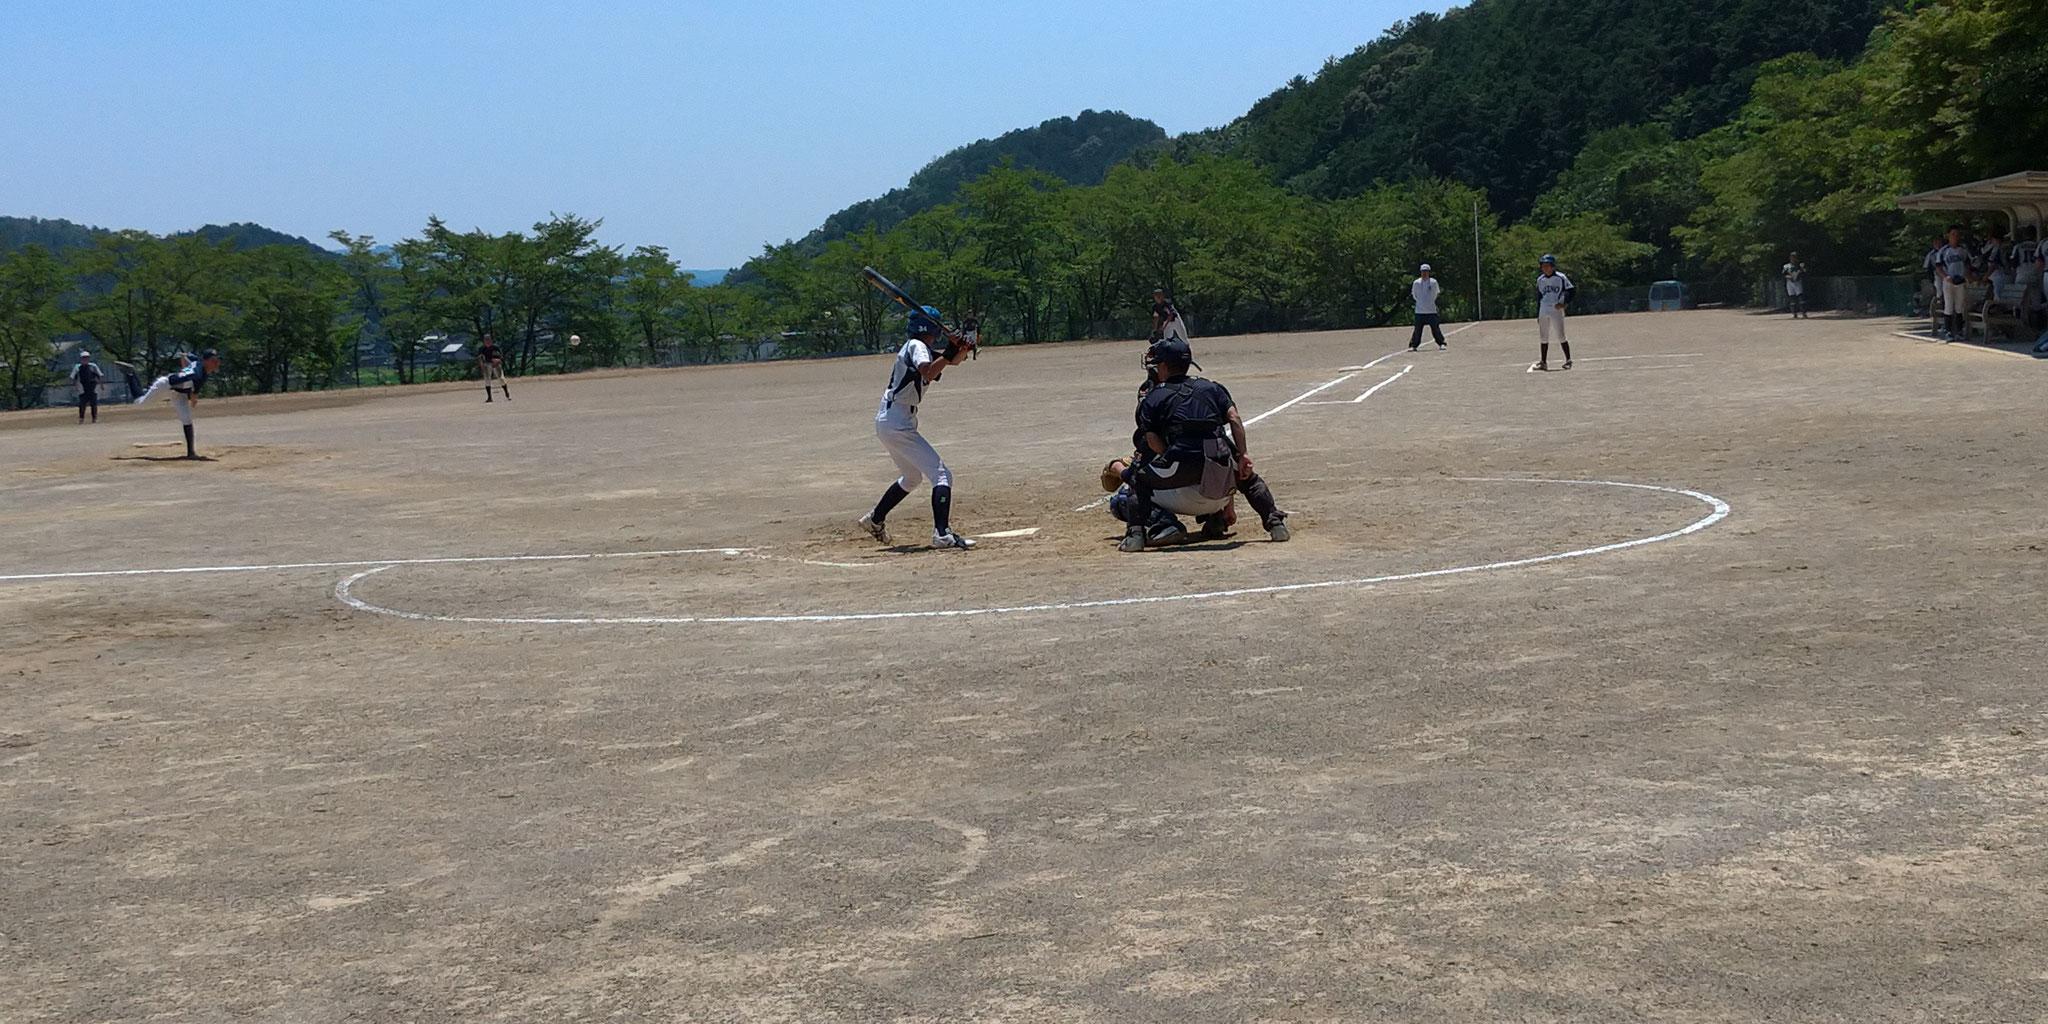 34 Ito Mahiru